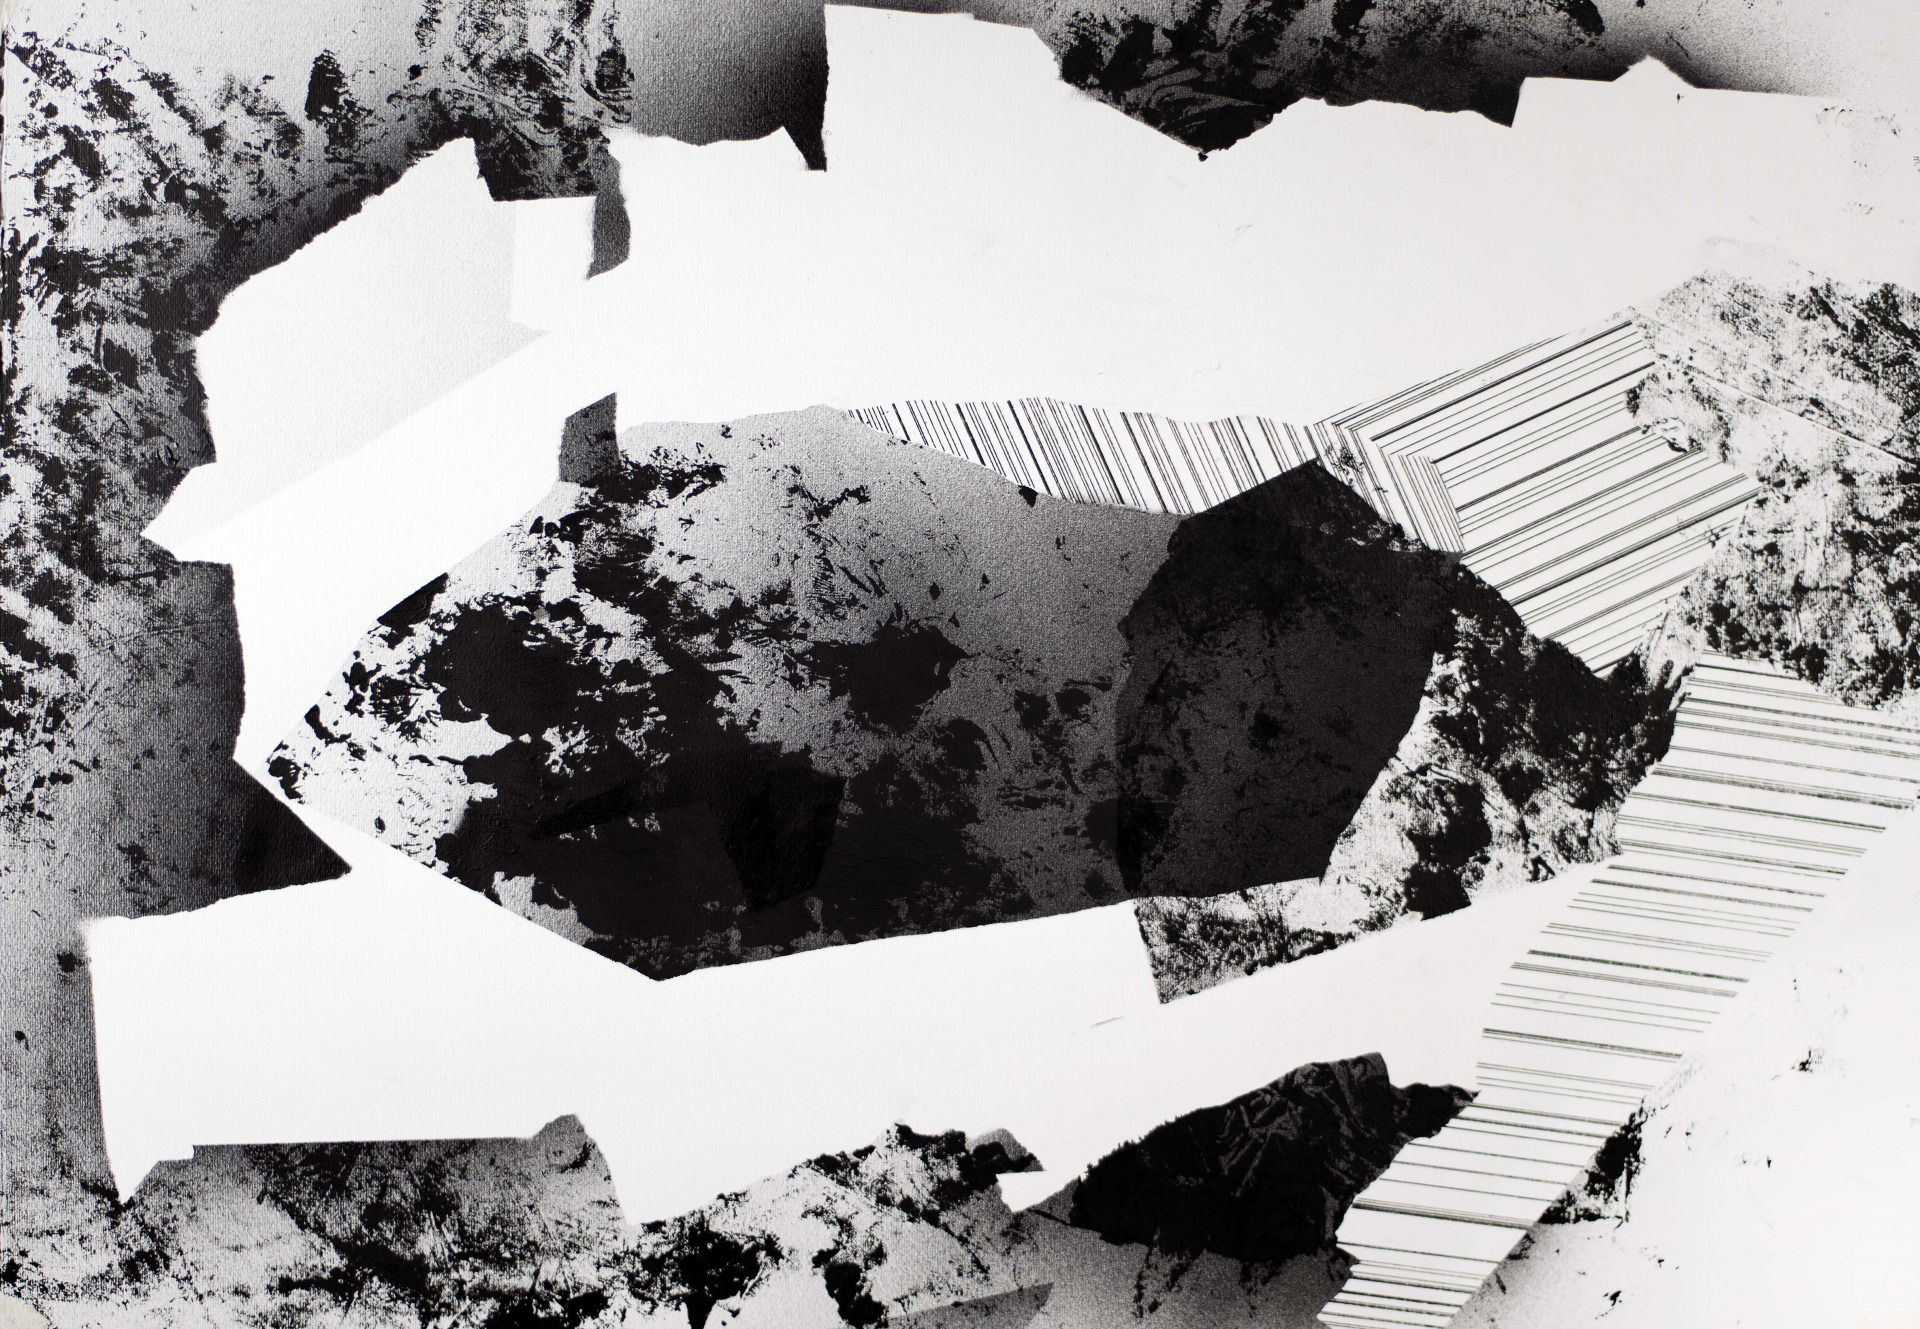 Contemporary art from Gyula Sági | Op. 280221. 1